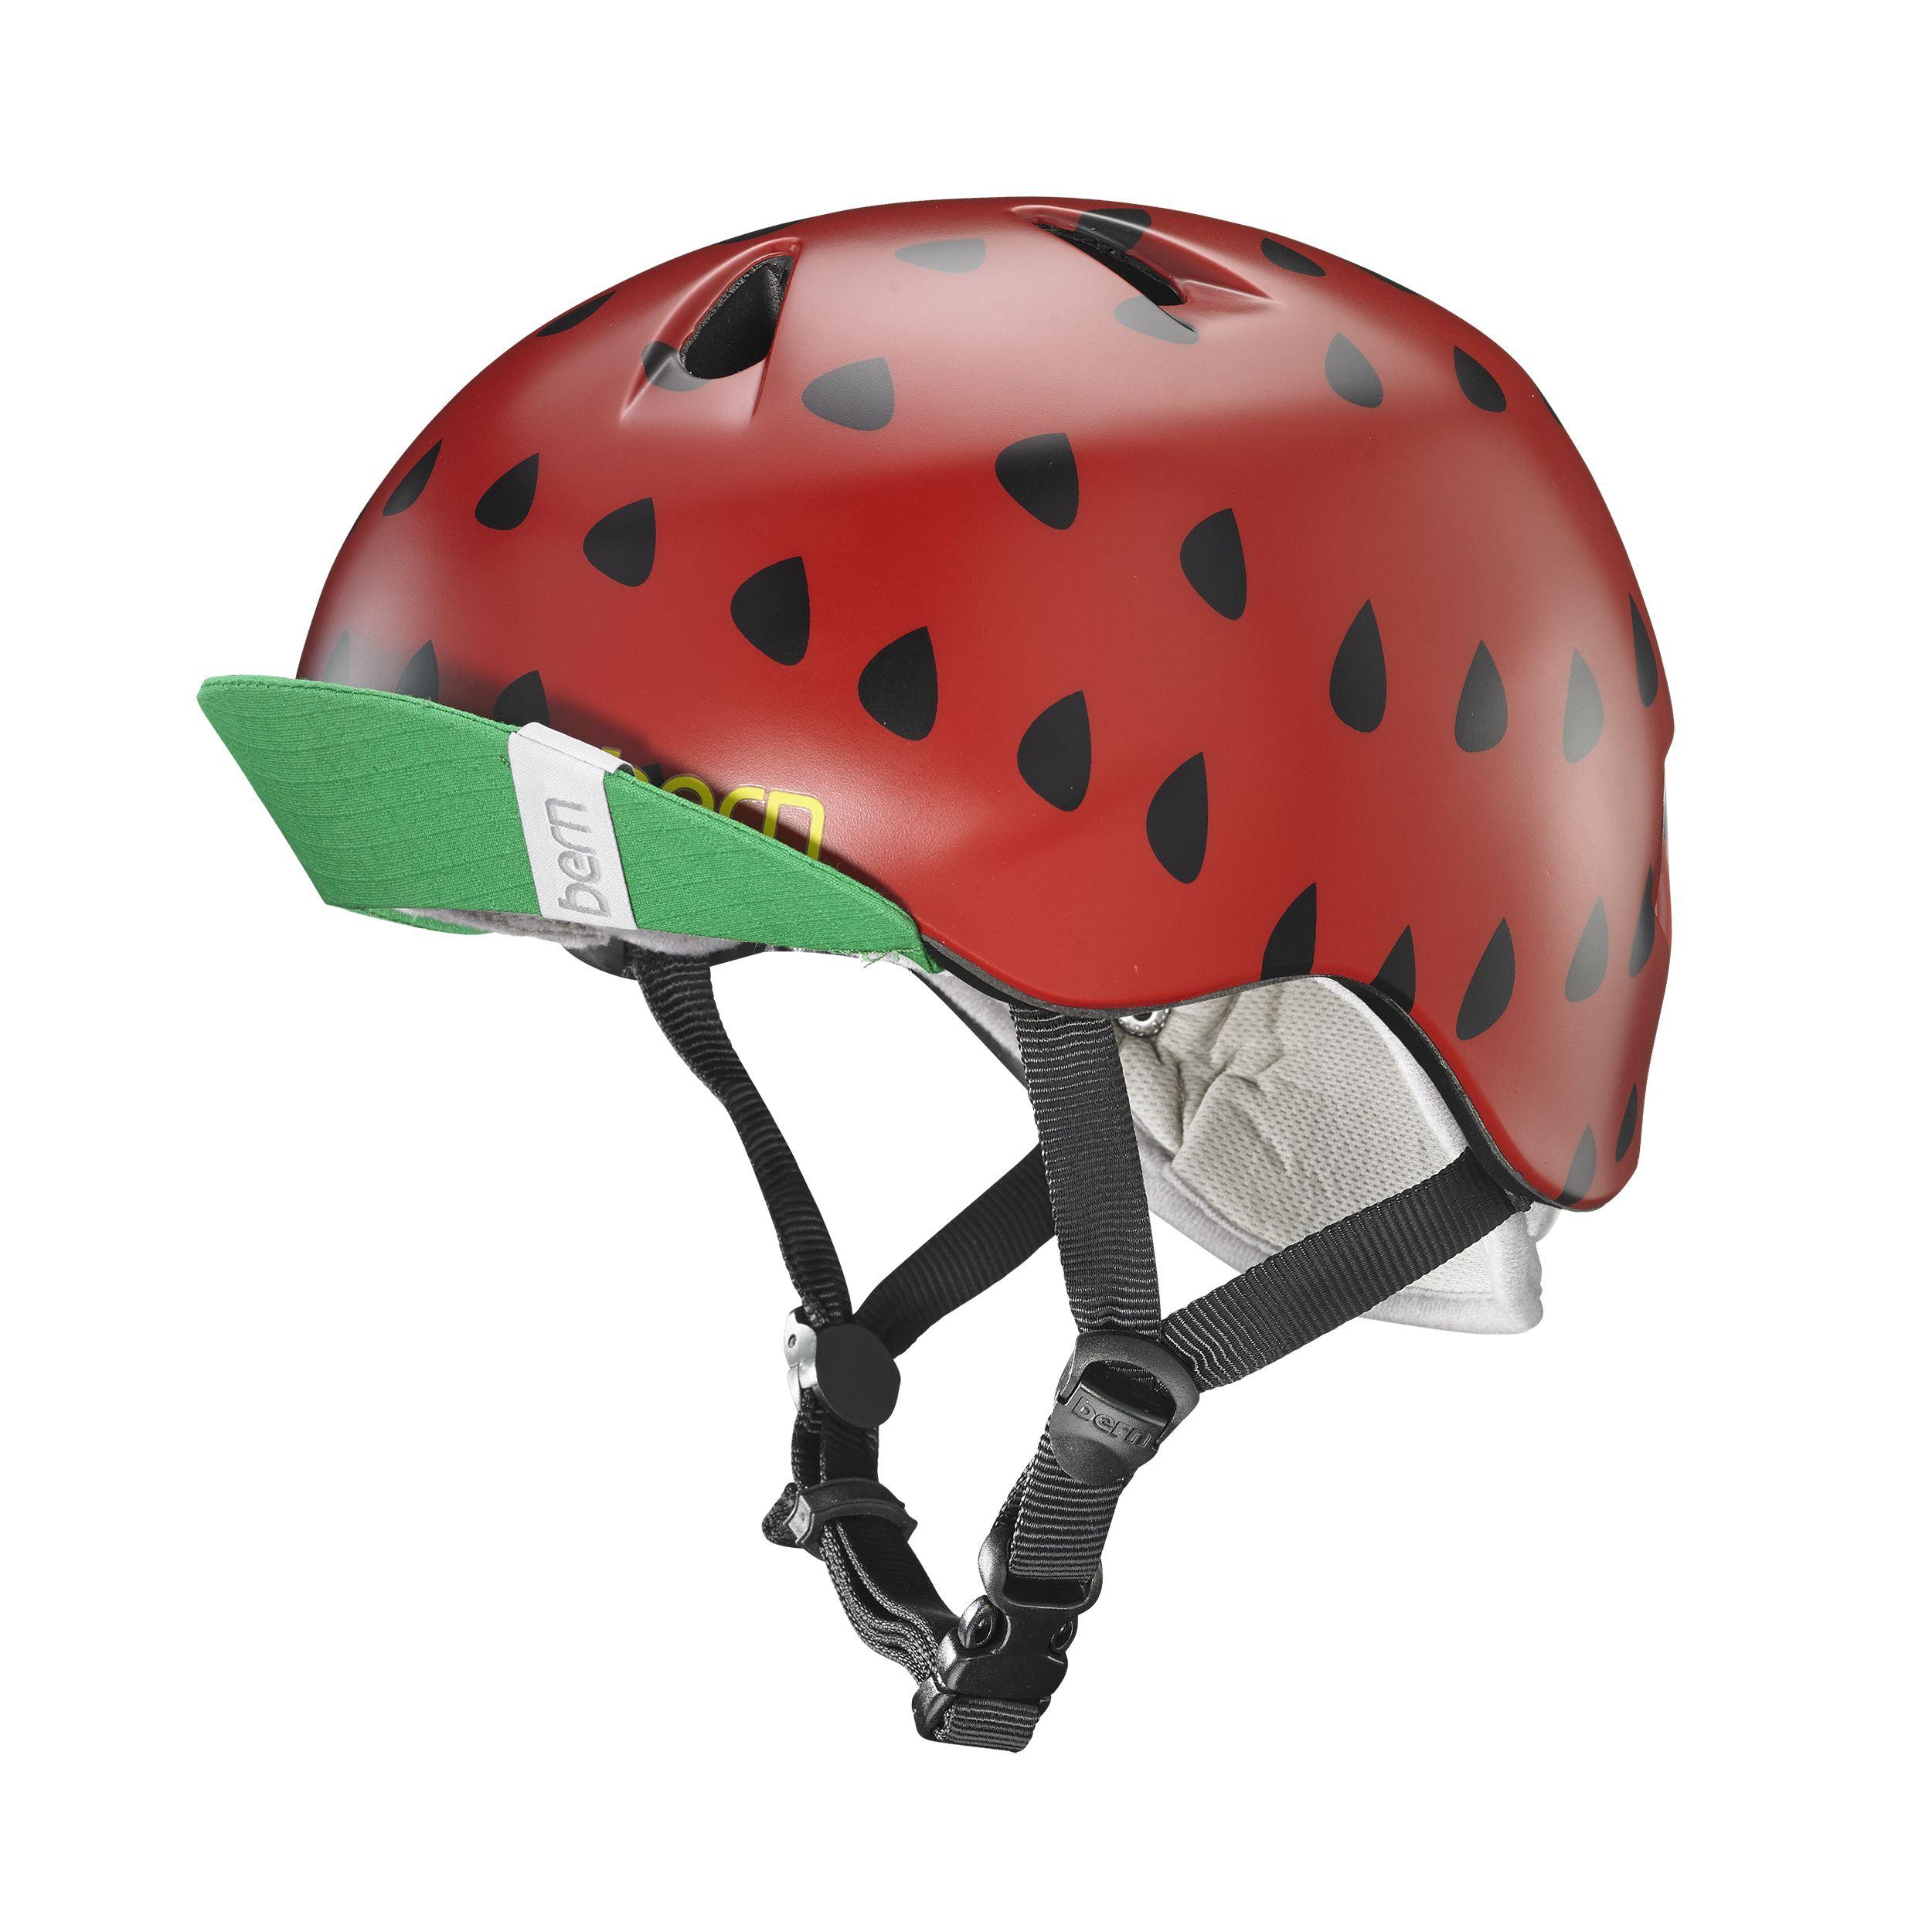 Baby bike helmet